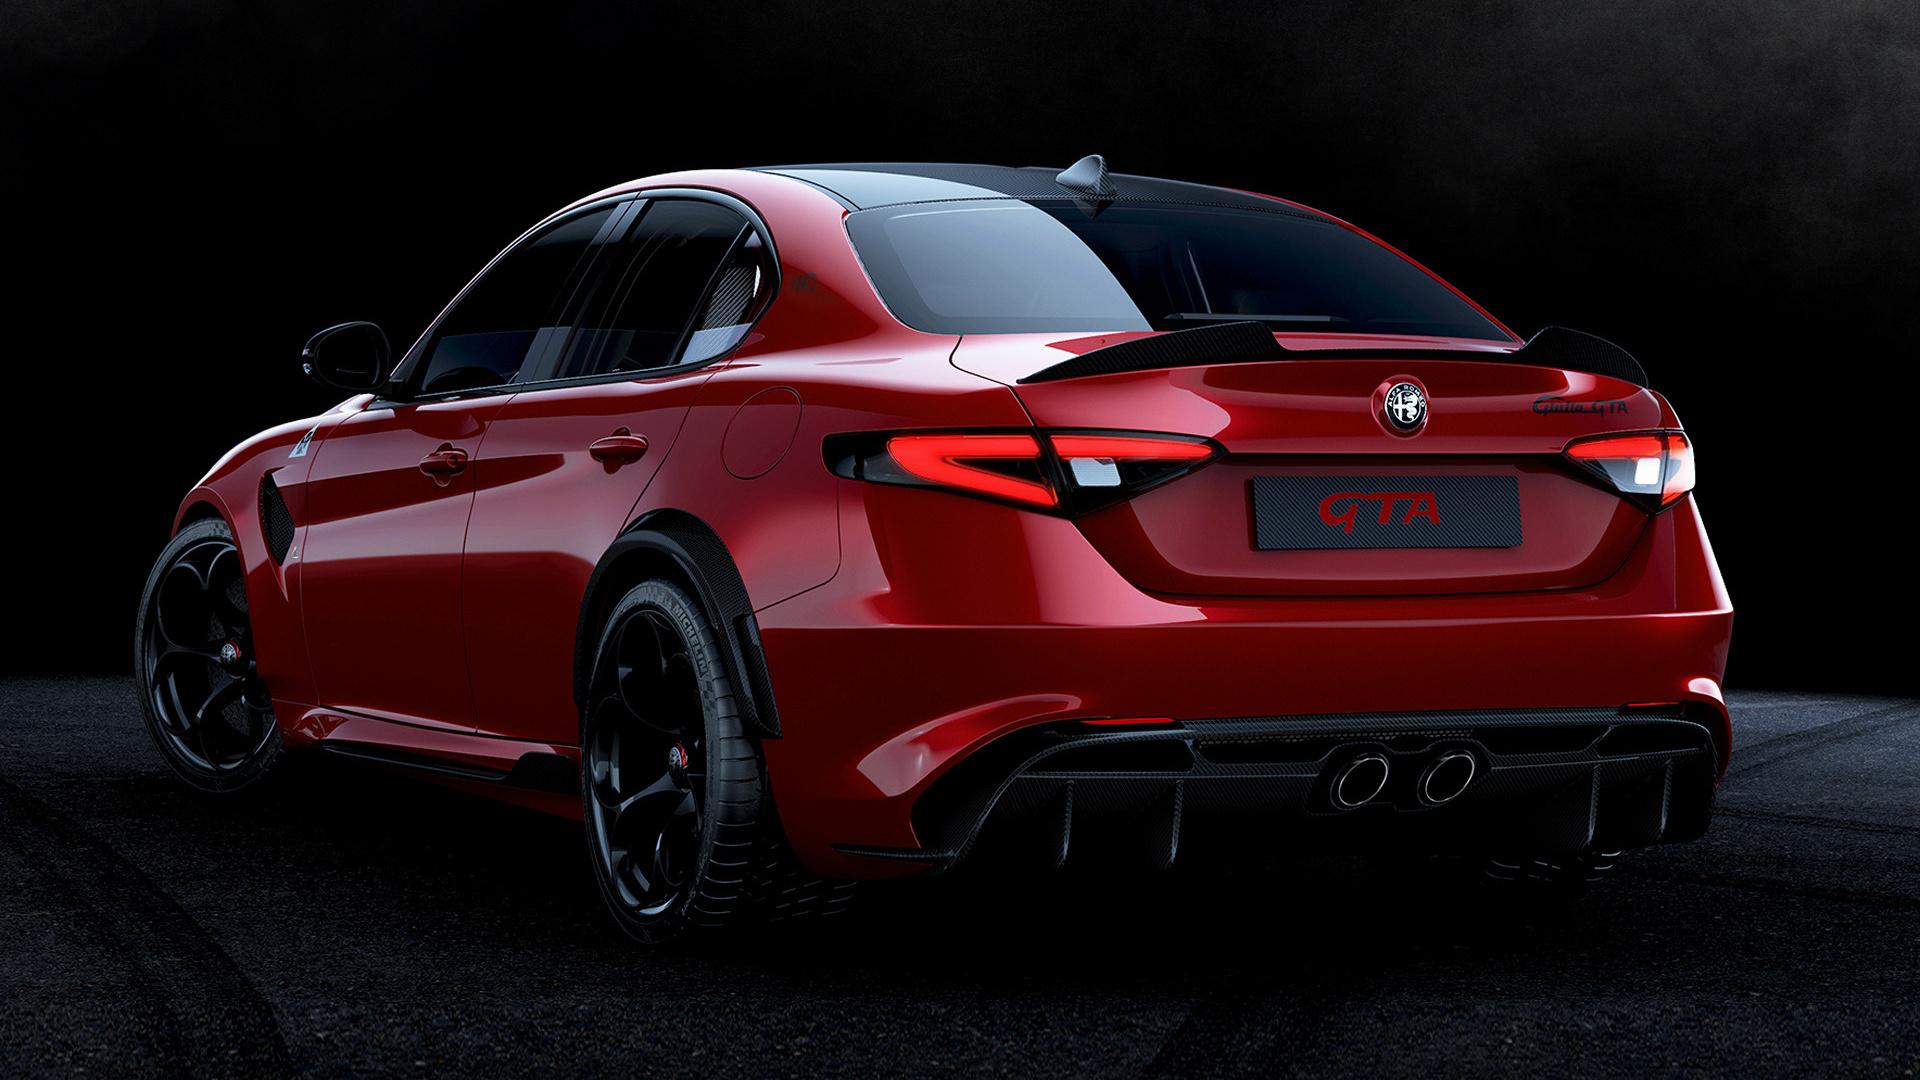 2020 Alfa Romeo Giulia GTA - Wallpapers and HD Images ...